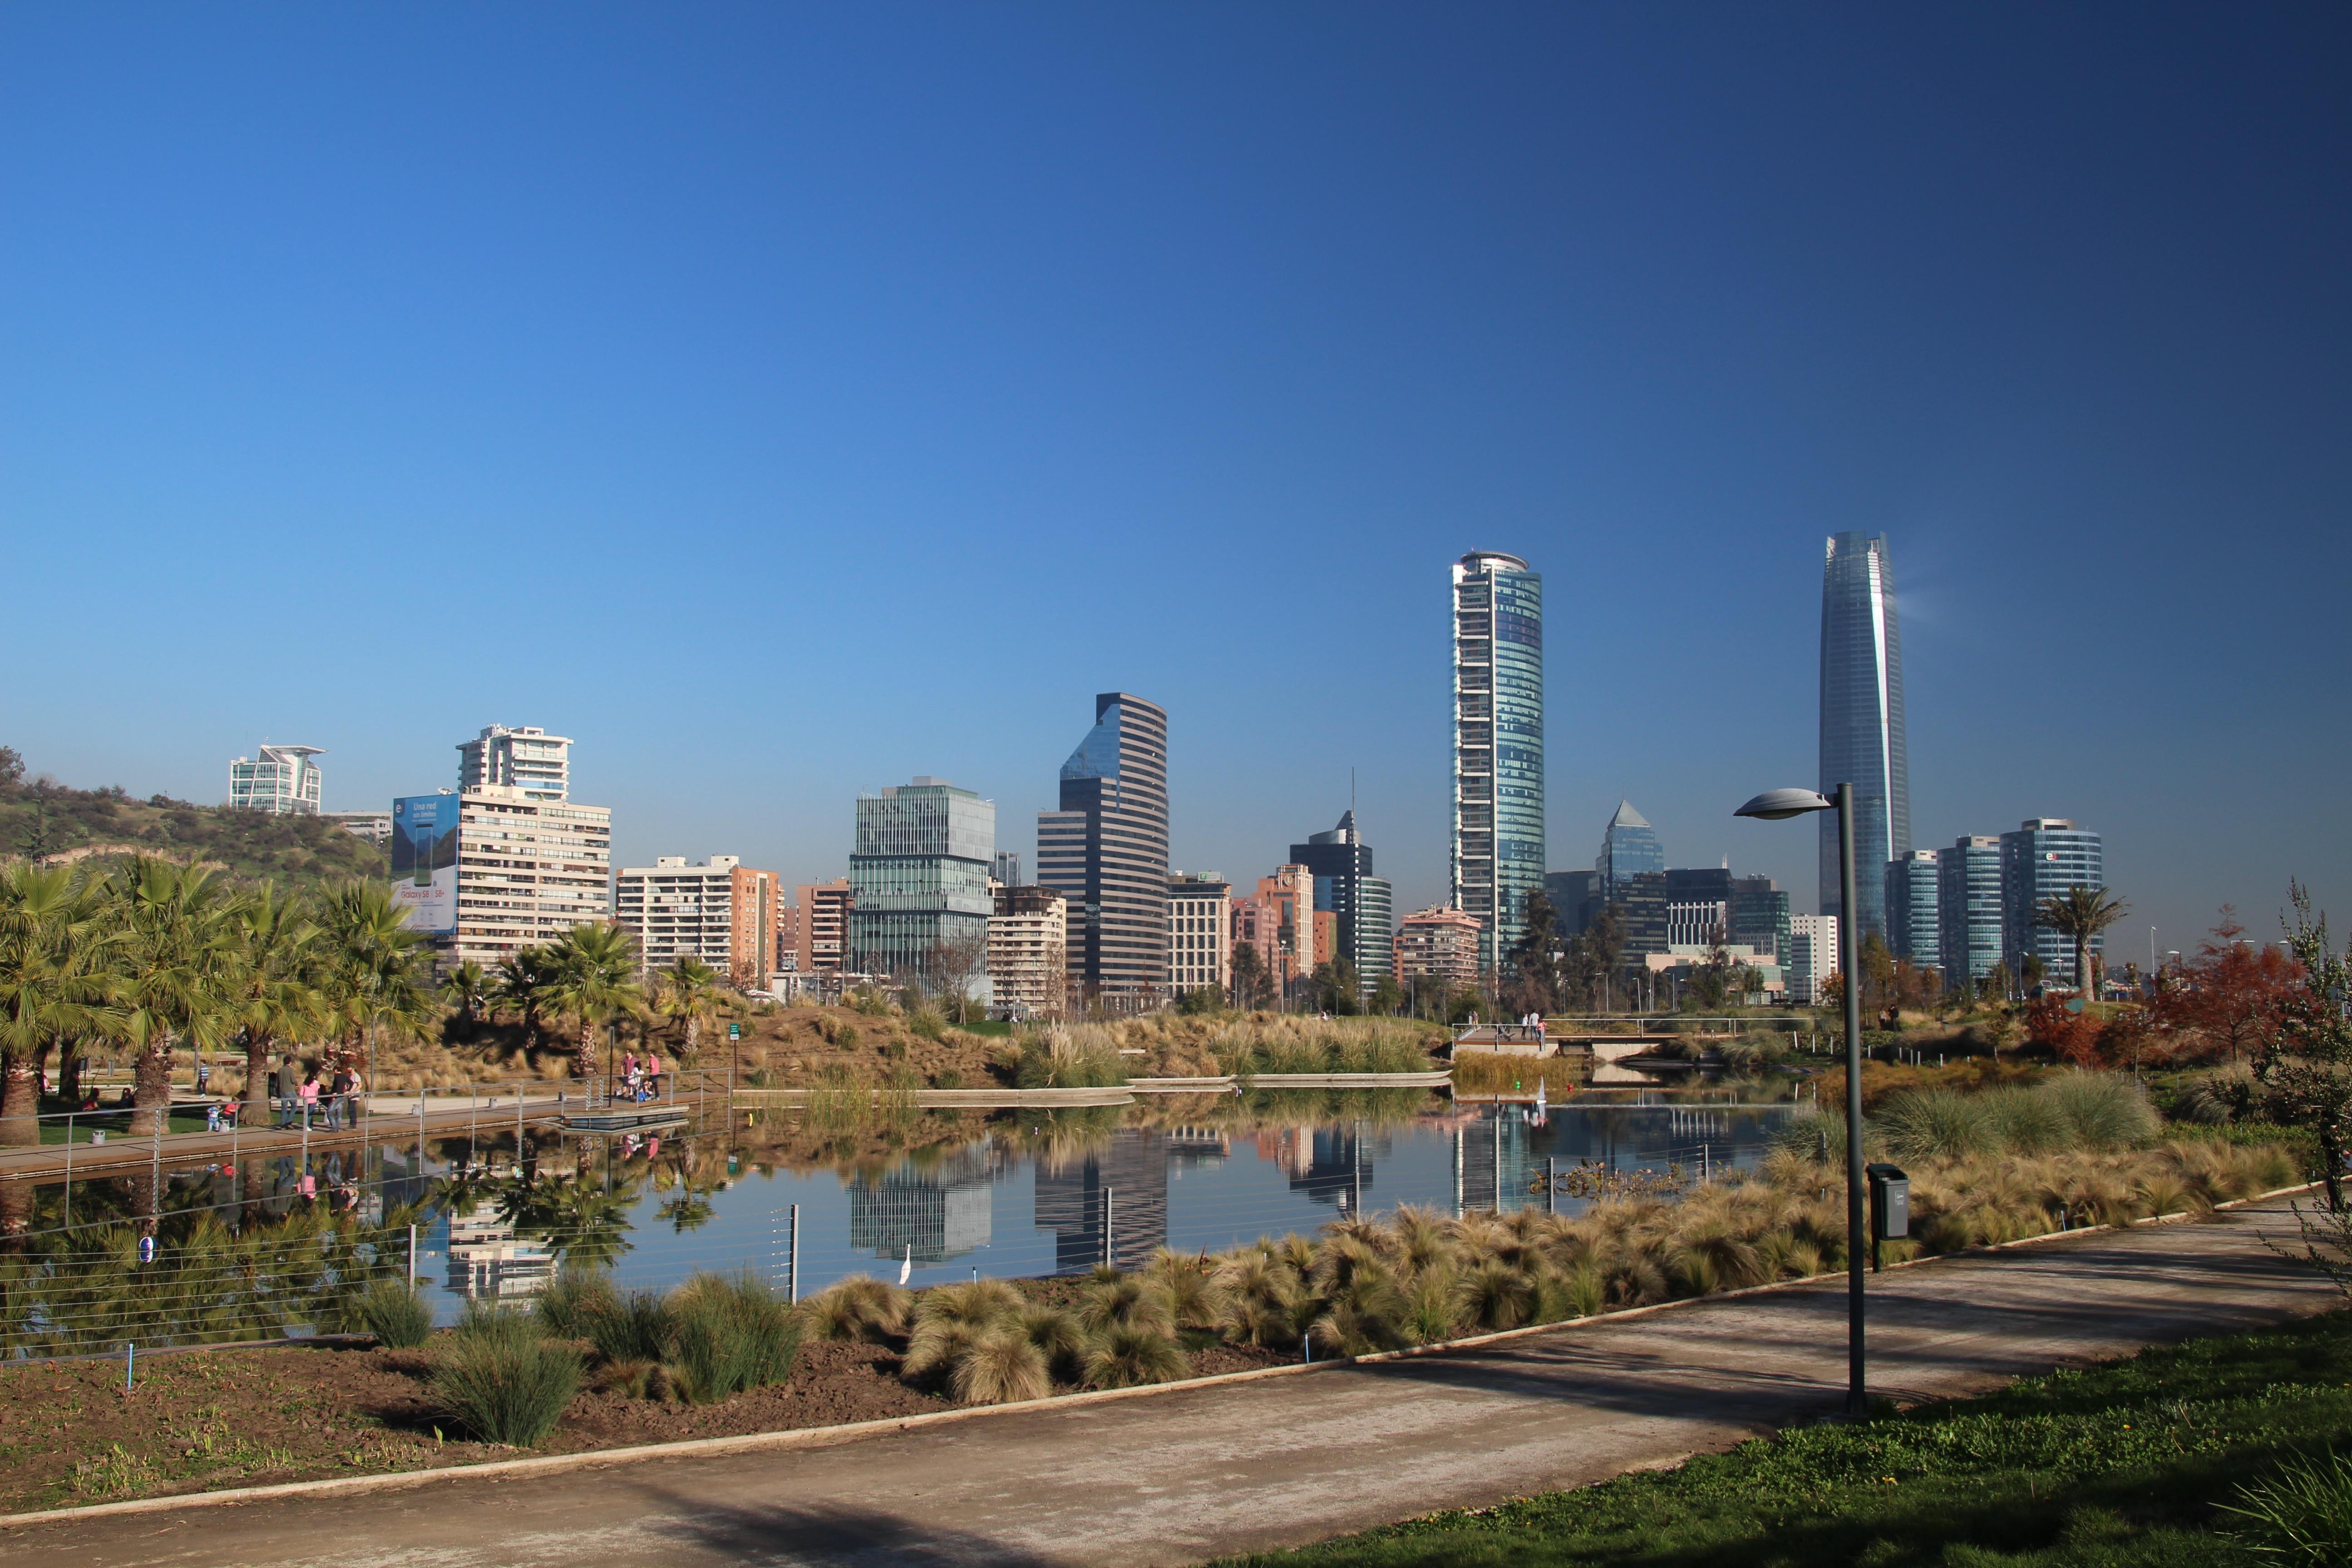 sanhattan chili parc bicentenario santiago de chile sky line